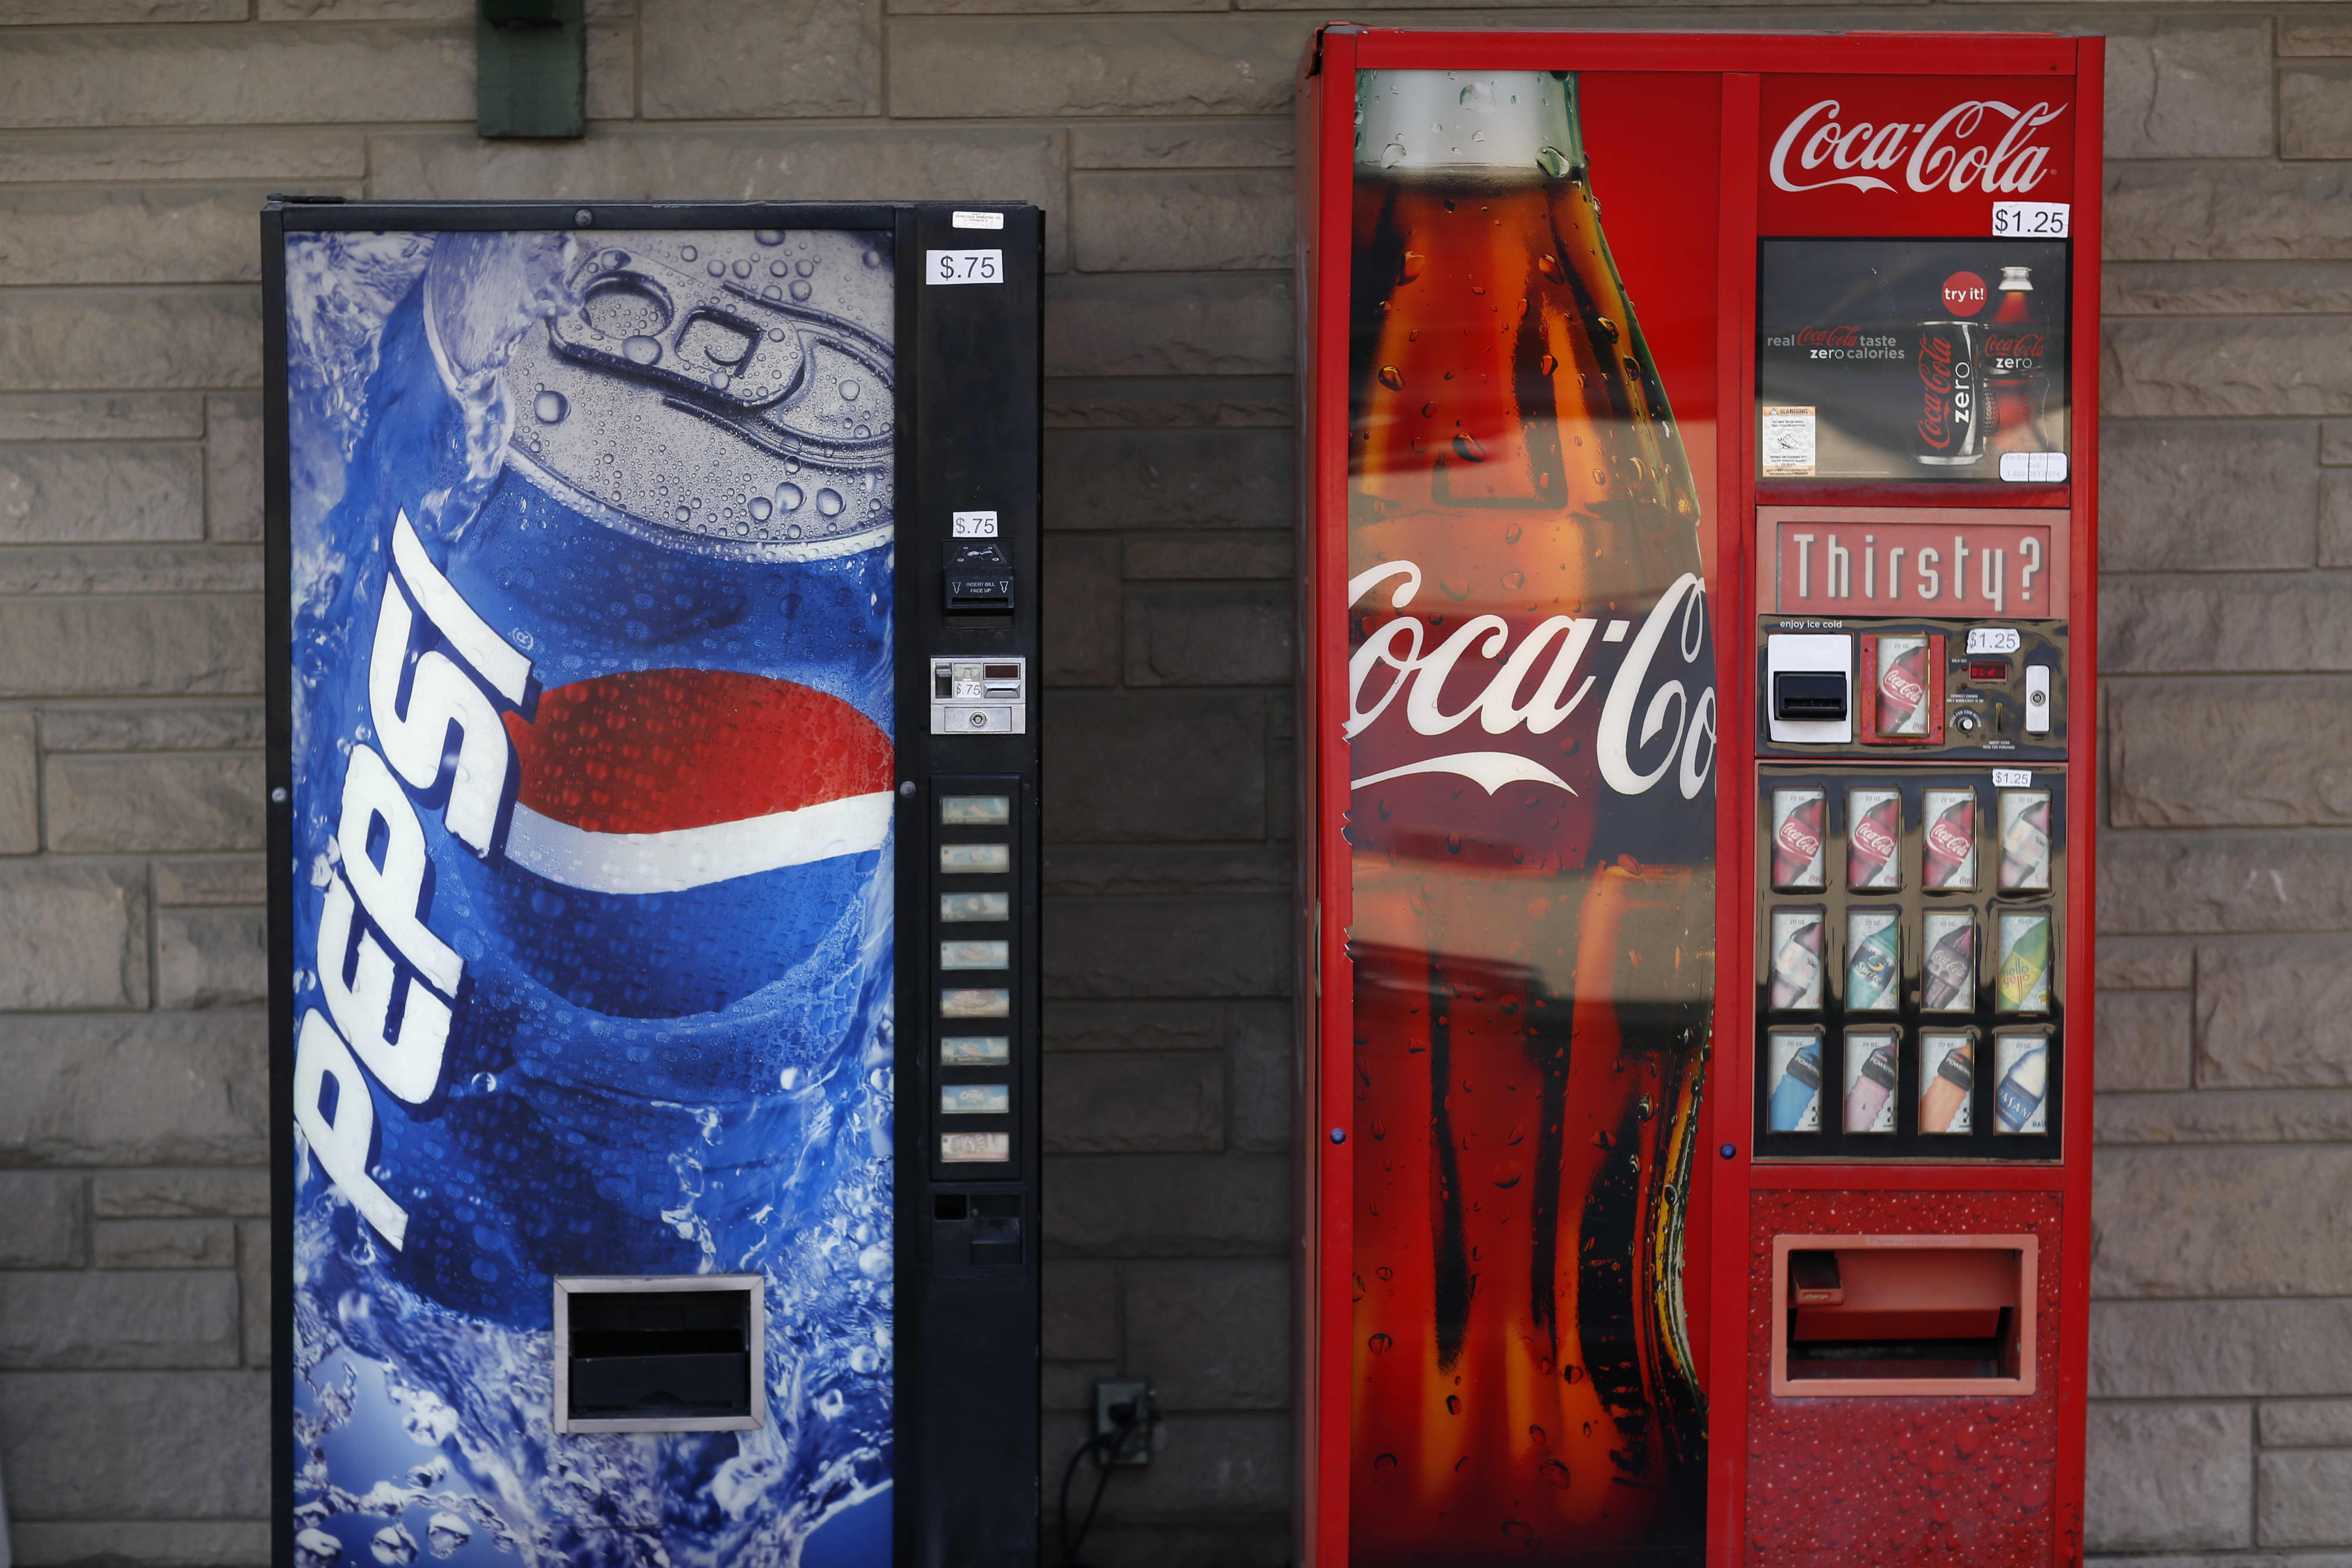 GP: Coca-Cola Pepsi vending machines soda pop sales